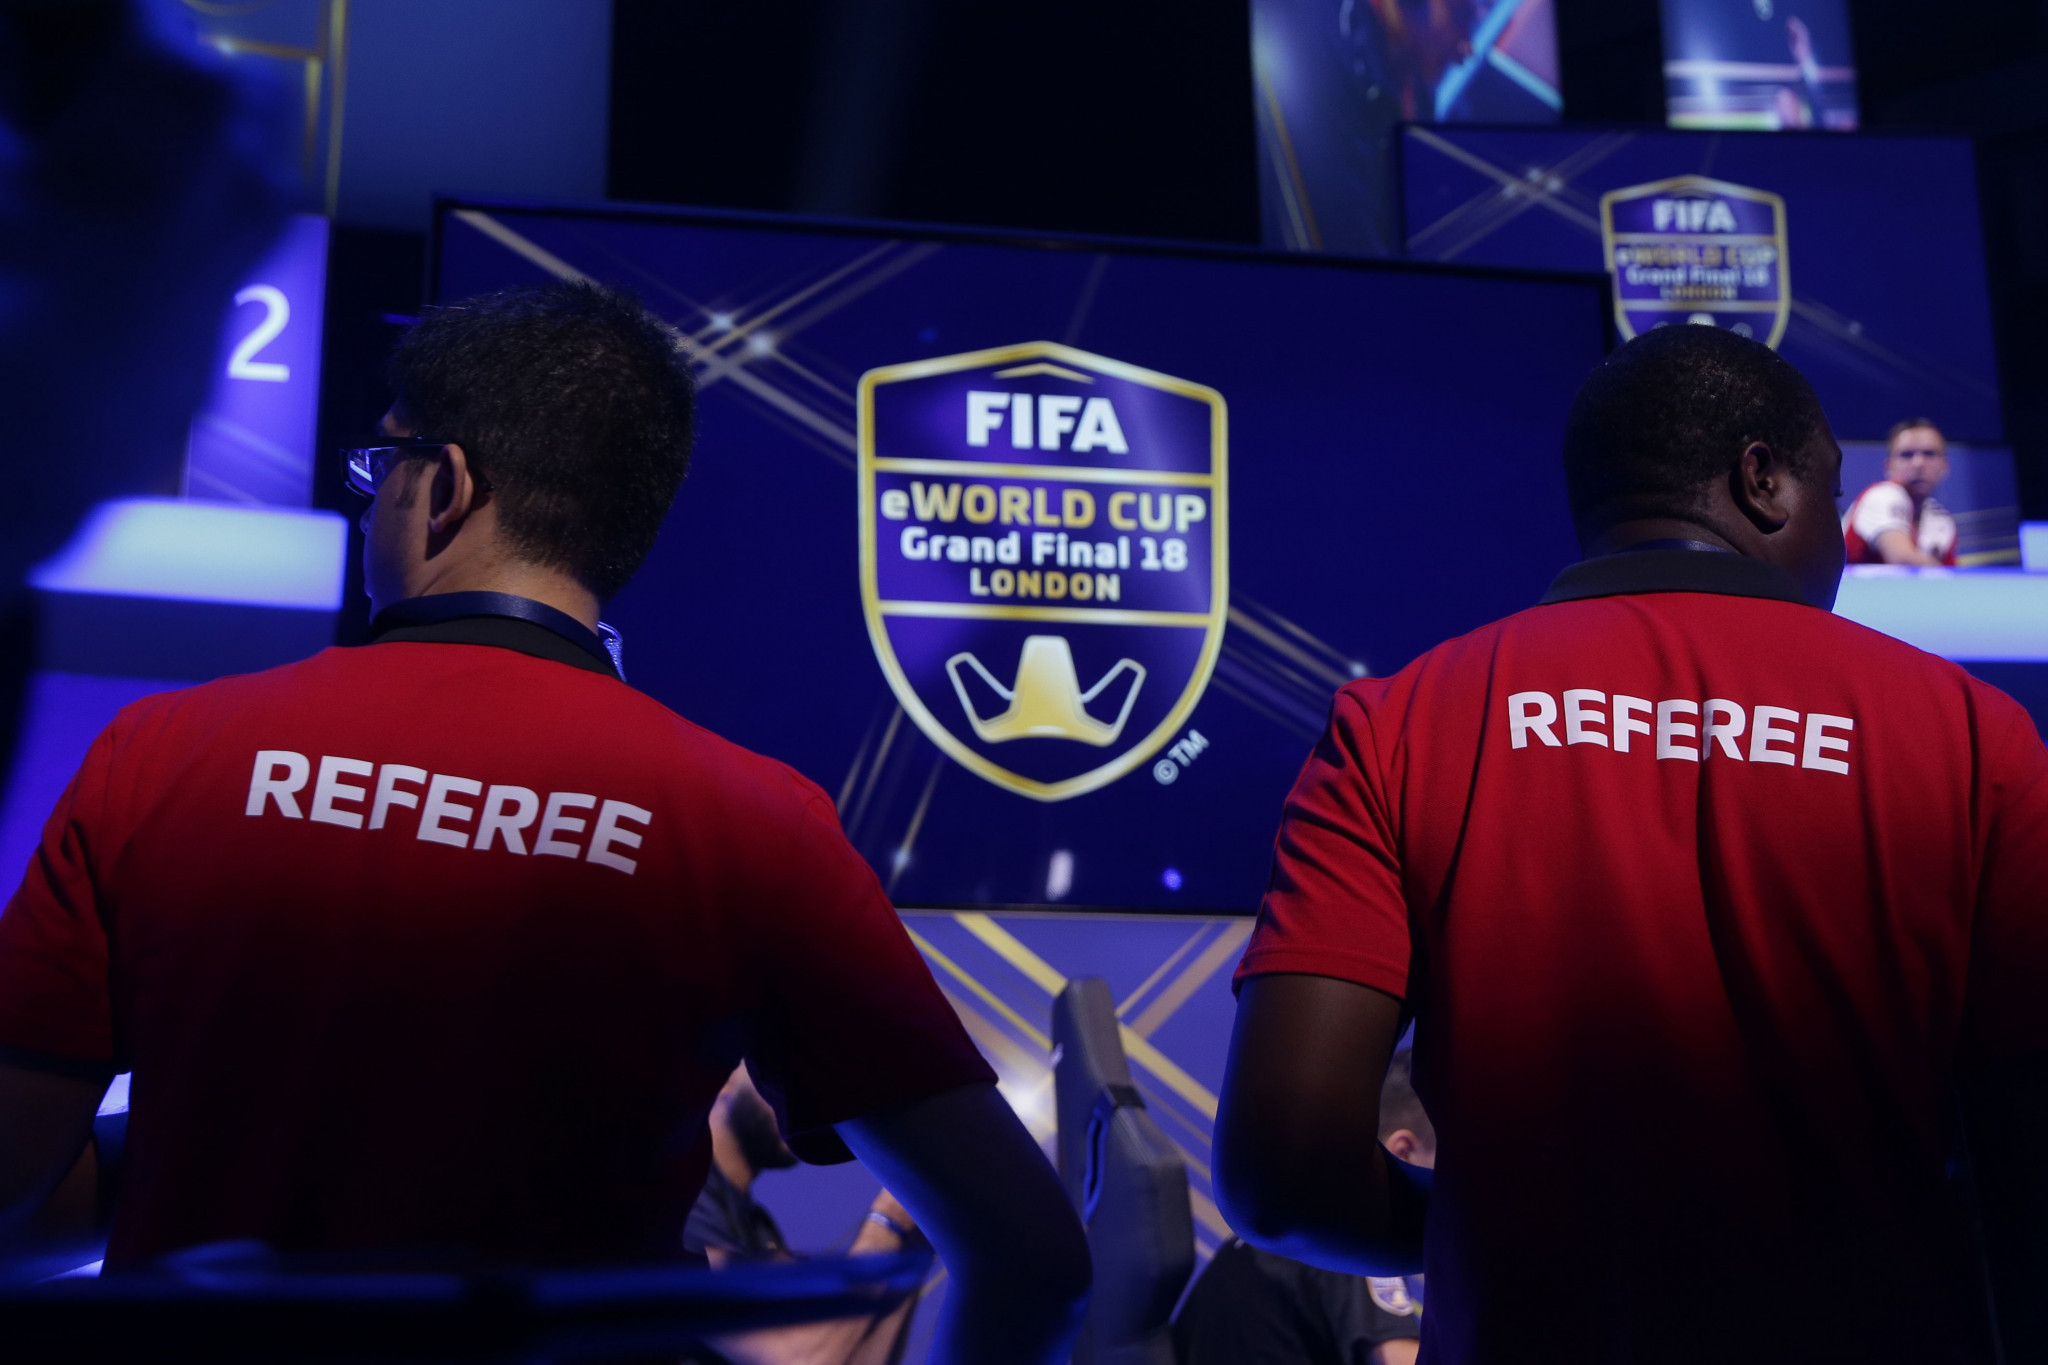 London set to host FIFA eWorld Cup Grand Final